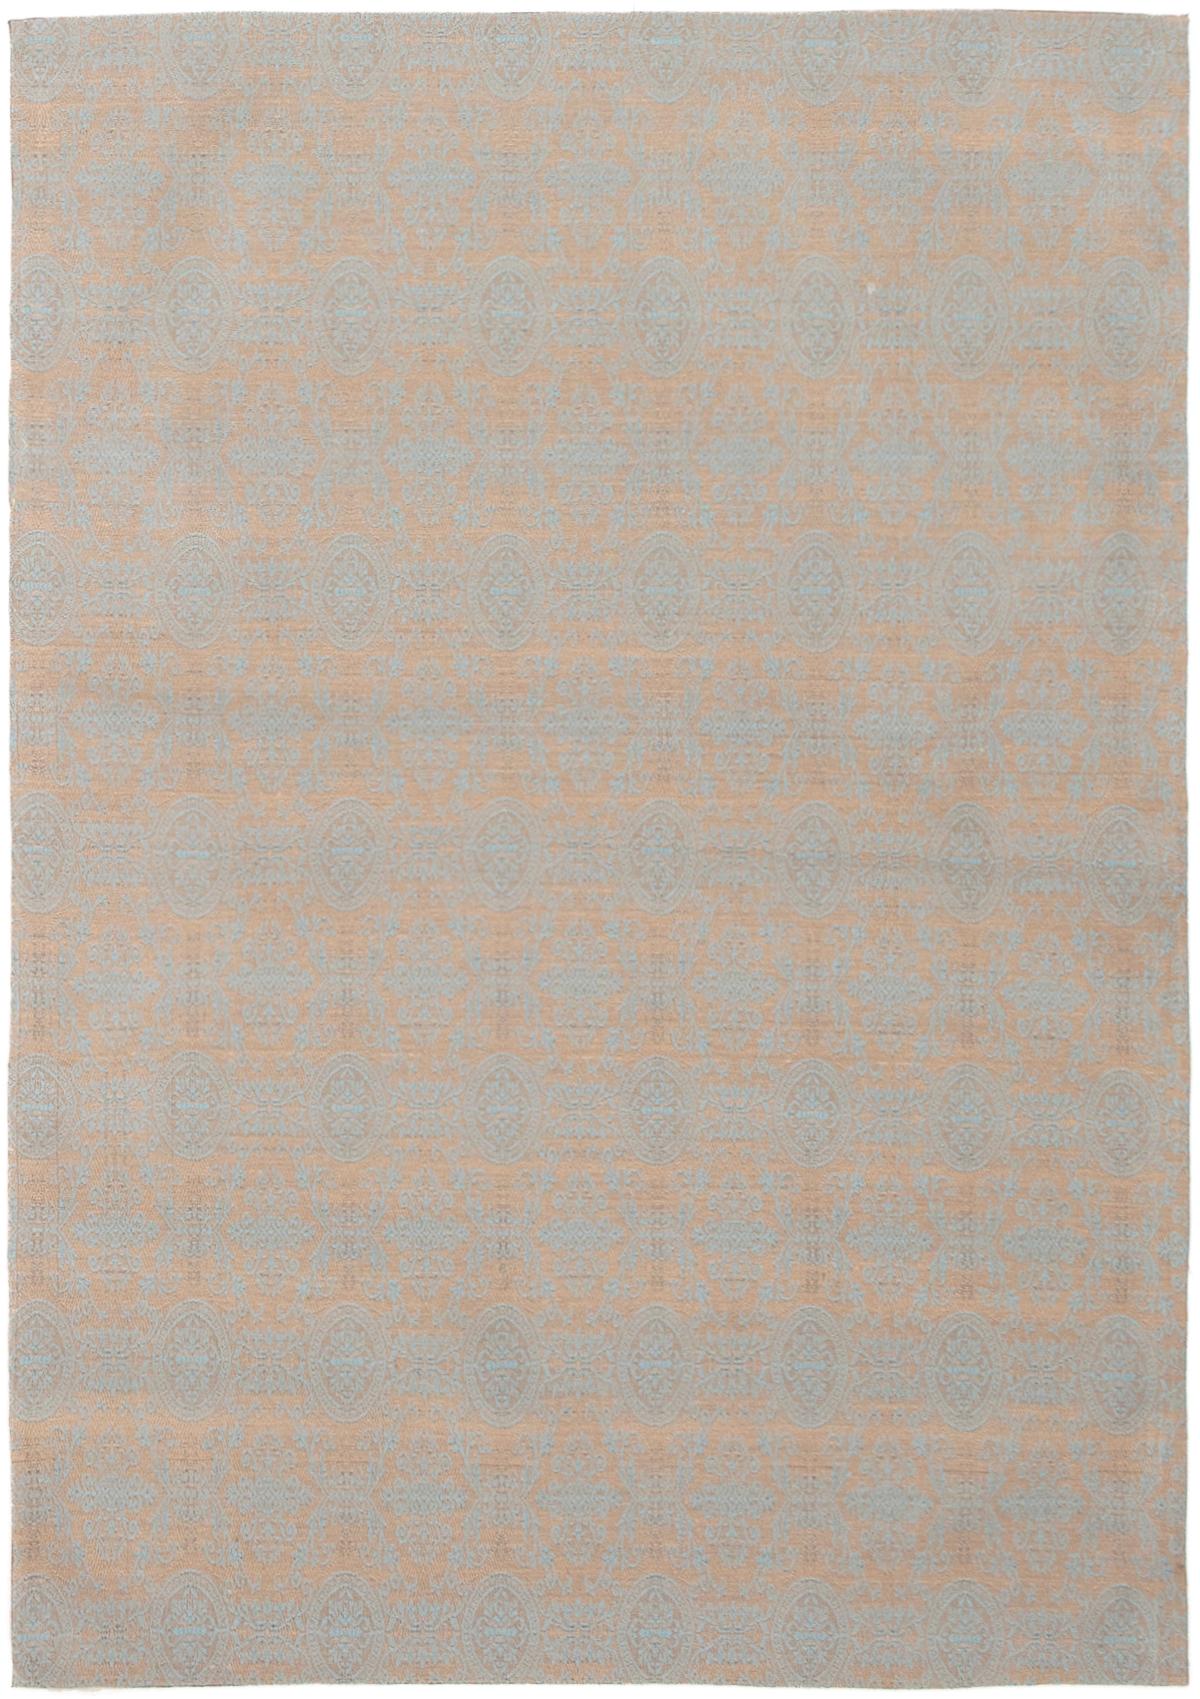 "Handmade Collage Light Blue , Tan Chenille Rug 4'9"" x 6'9"" Size: 4'9"" x 6'9"""